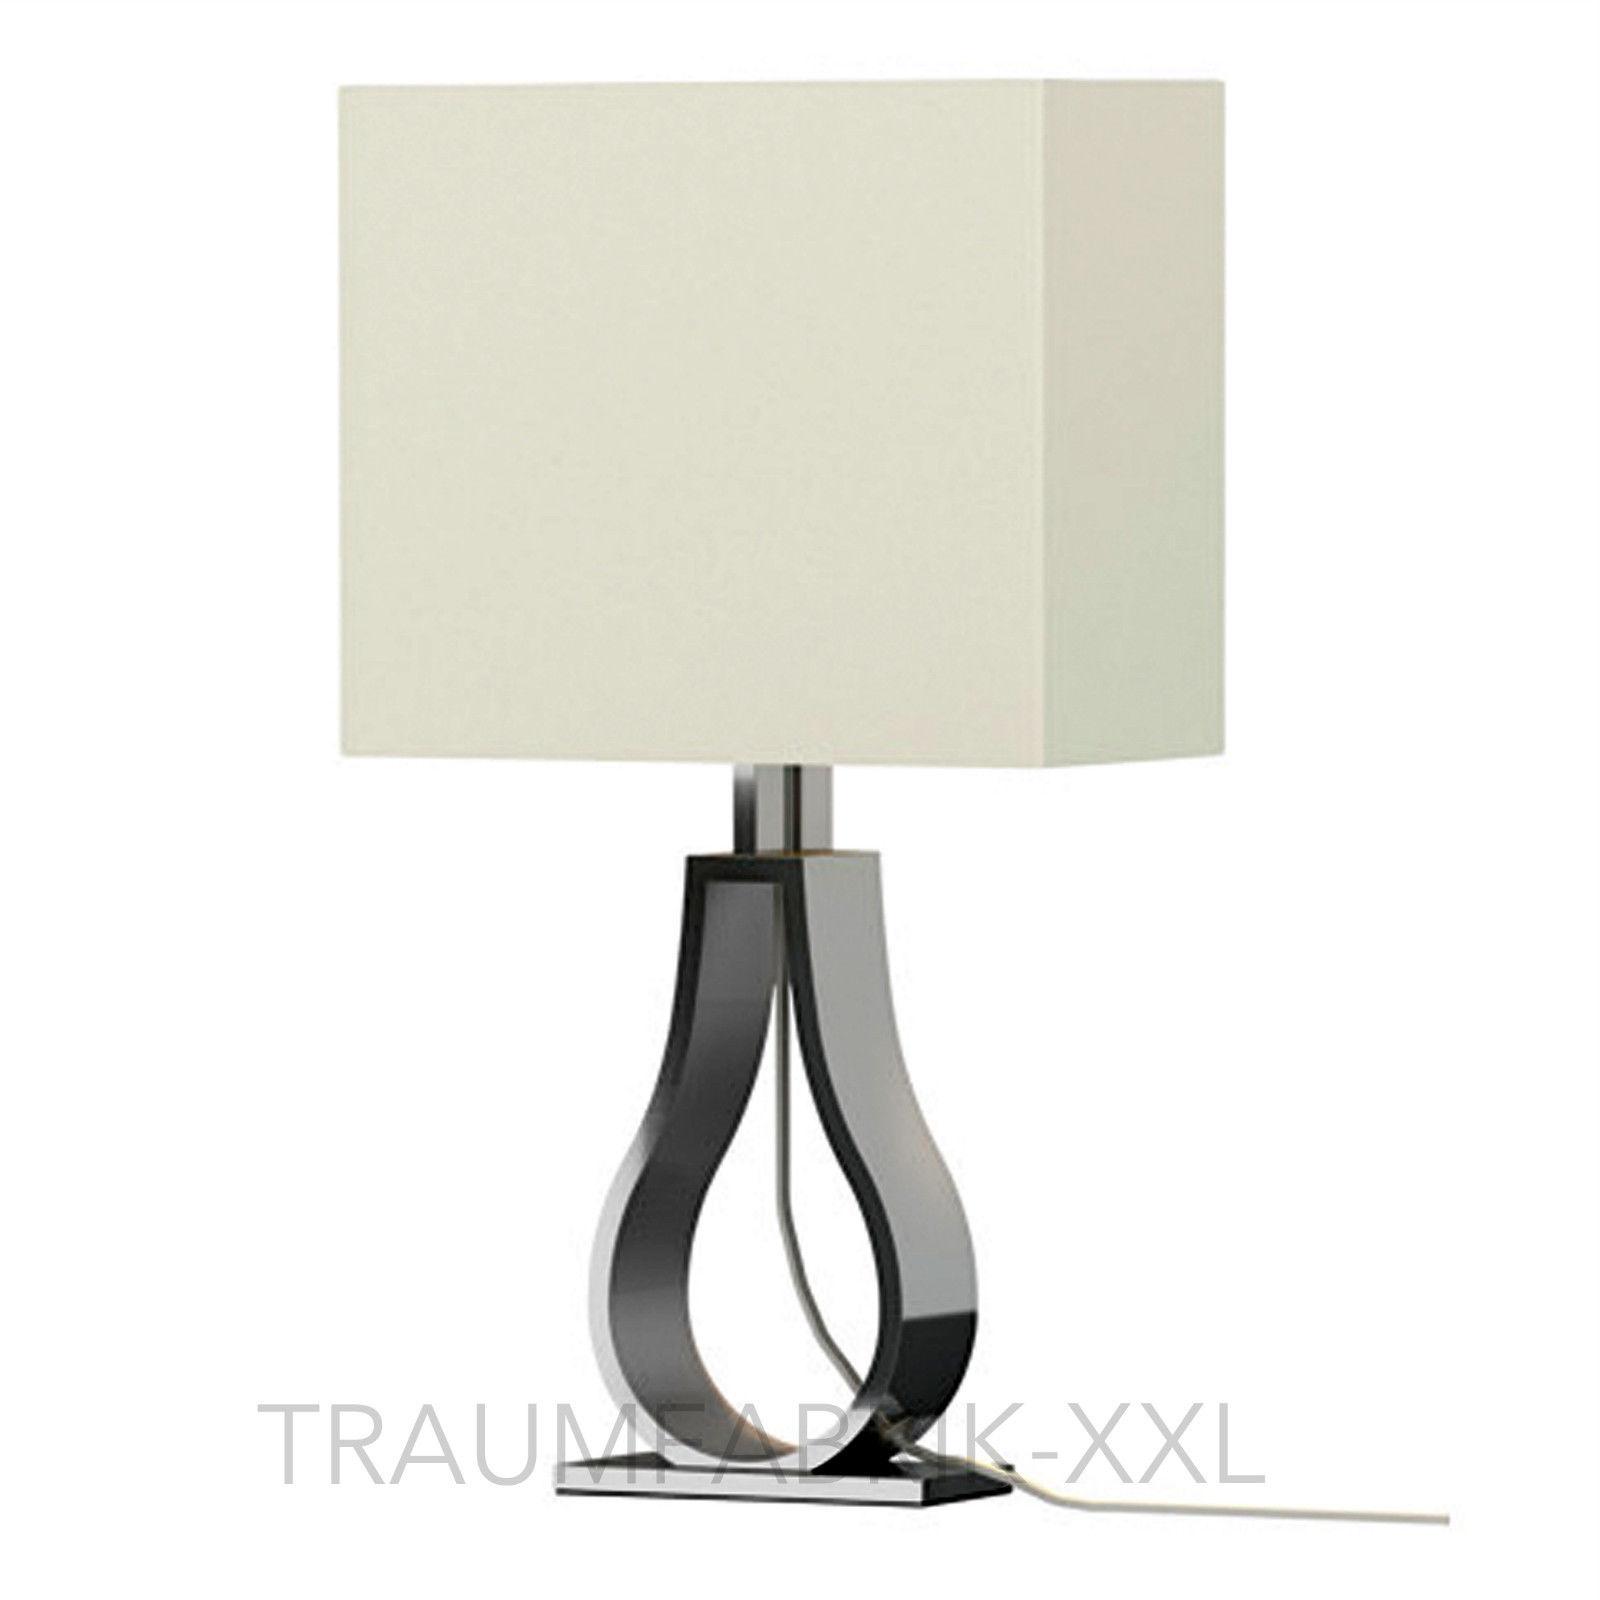 lampe rund top rund led lampe stor with lampe rund affordable led flammig deckenlampe bad. Black Bedroom Furniture Sets. Home Design Ideas